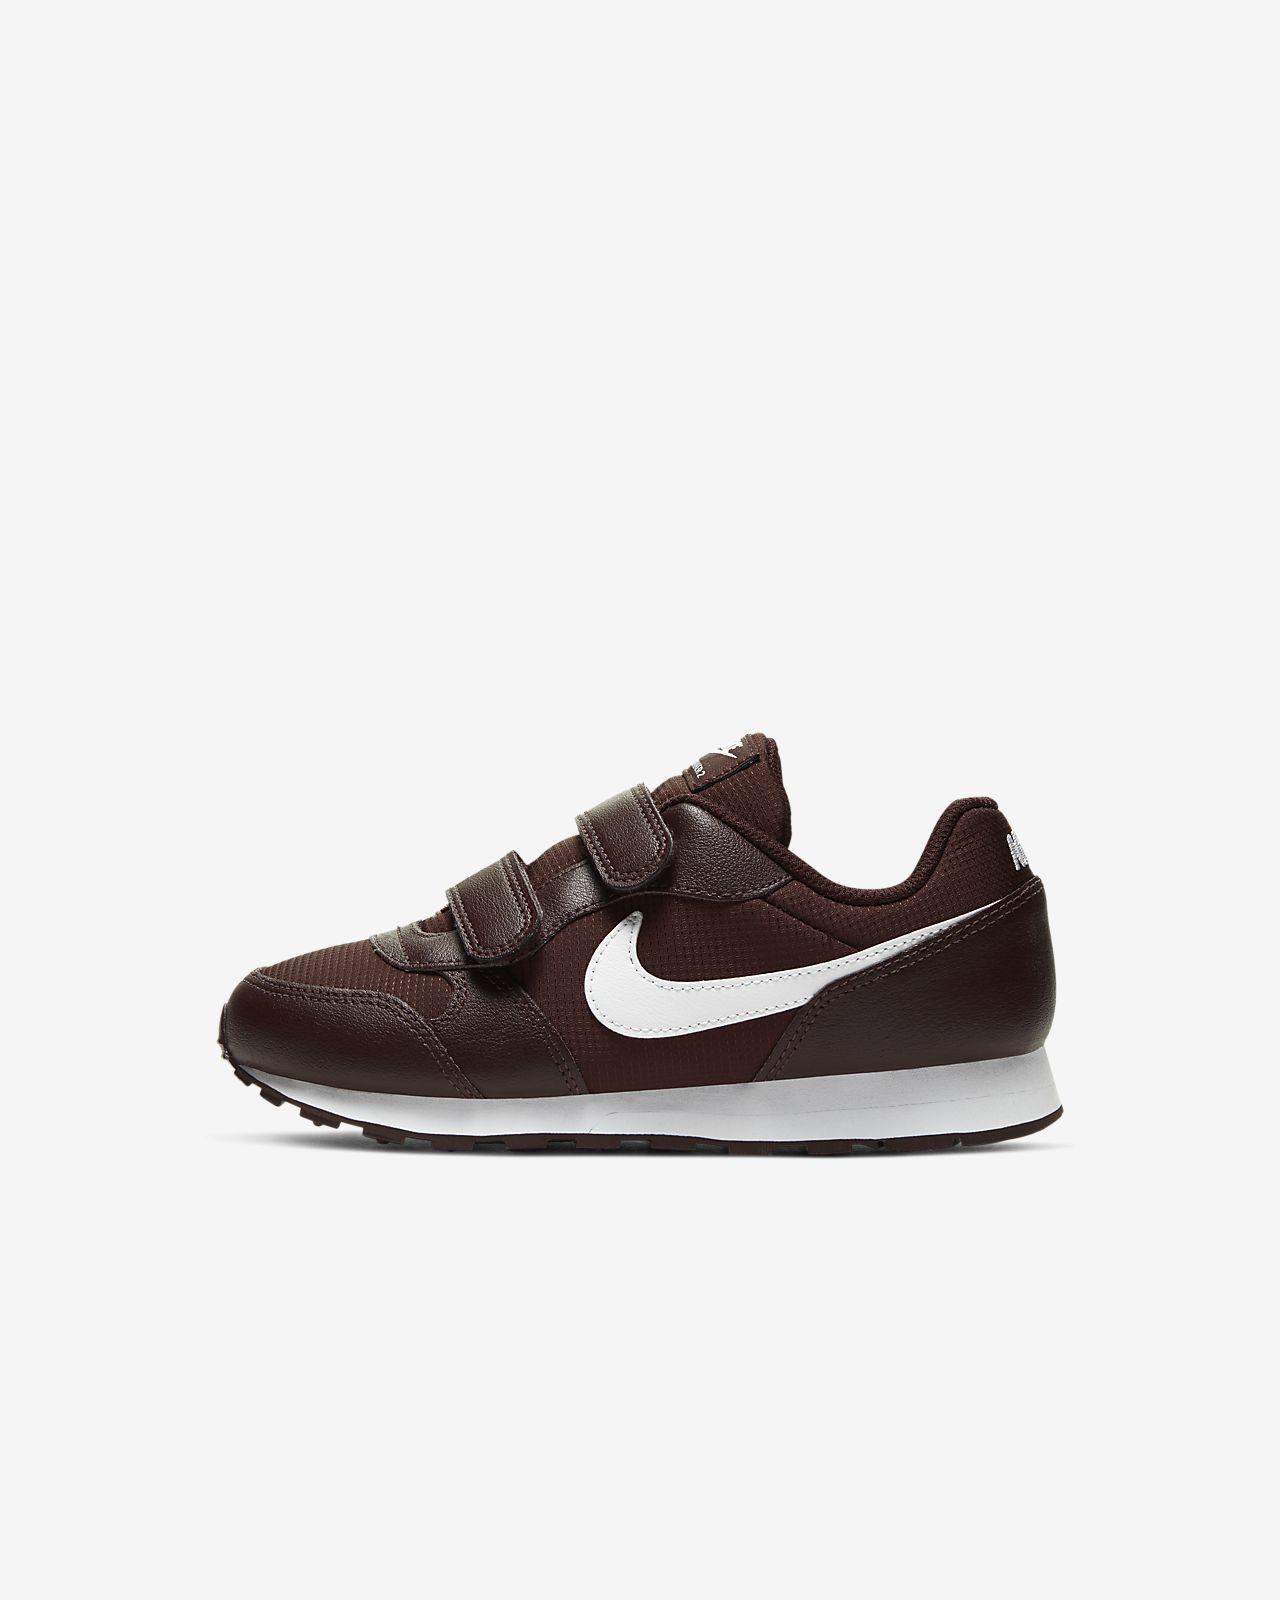 Nike MD Runner 2 PE Sabatilles - Nen/a petit/a